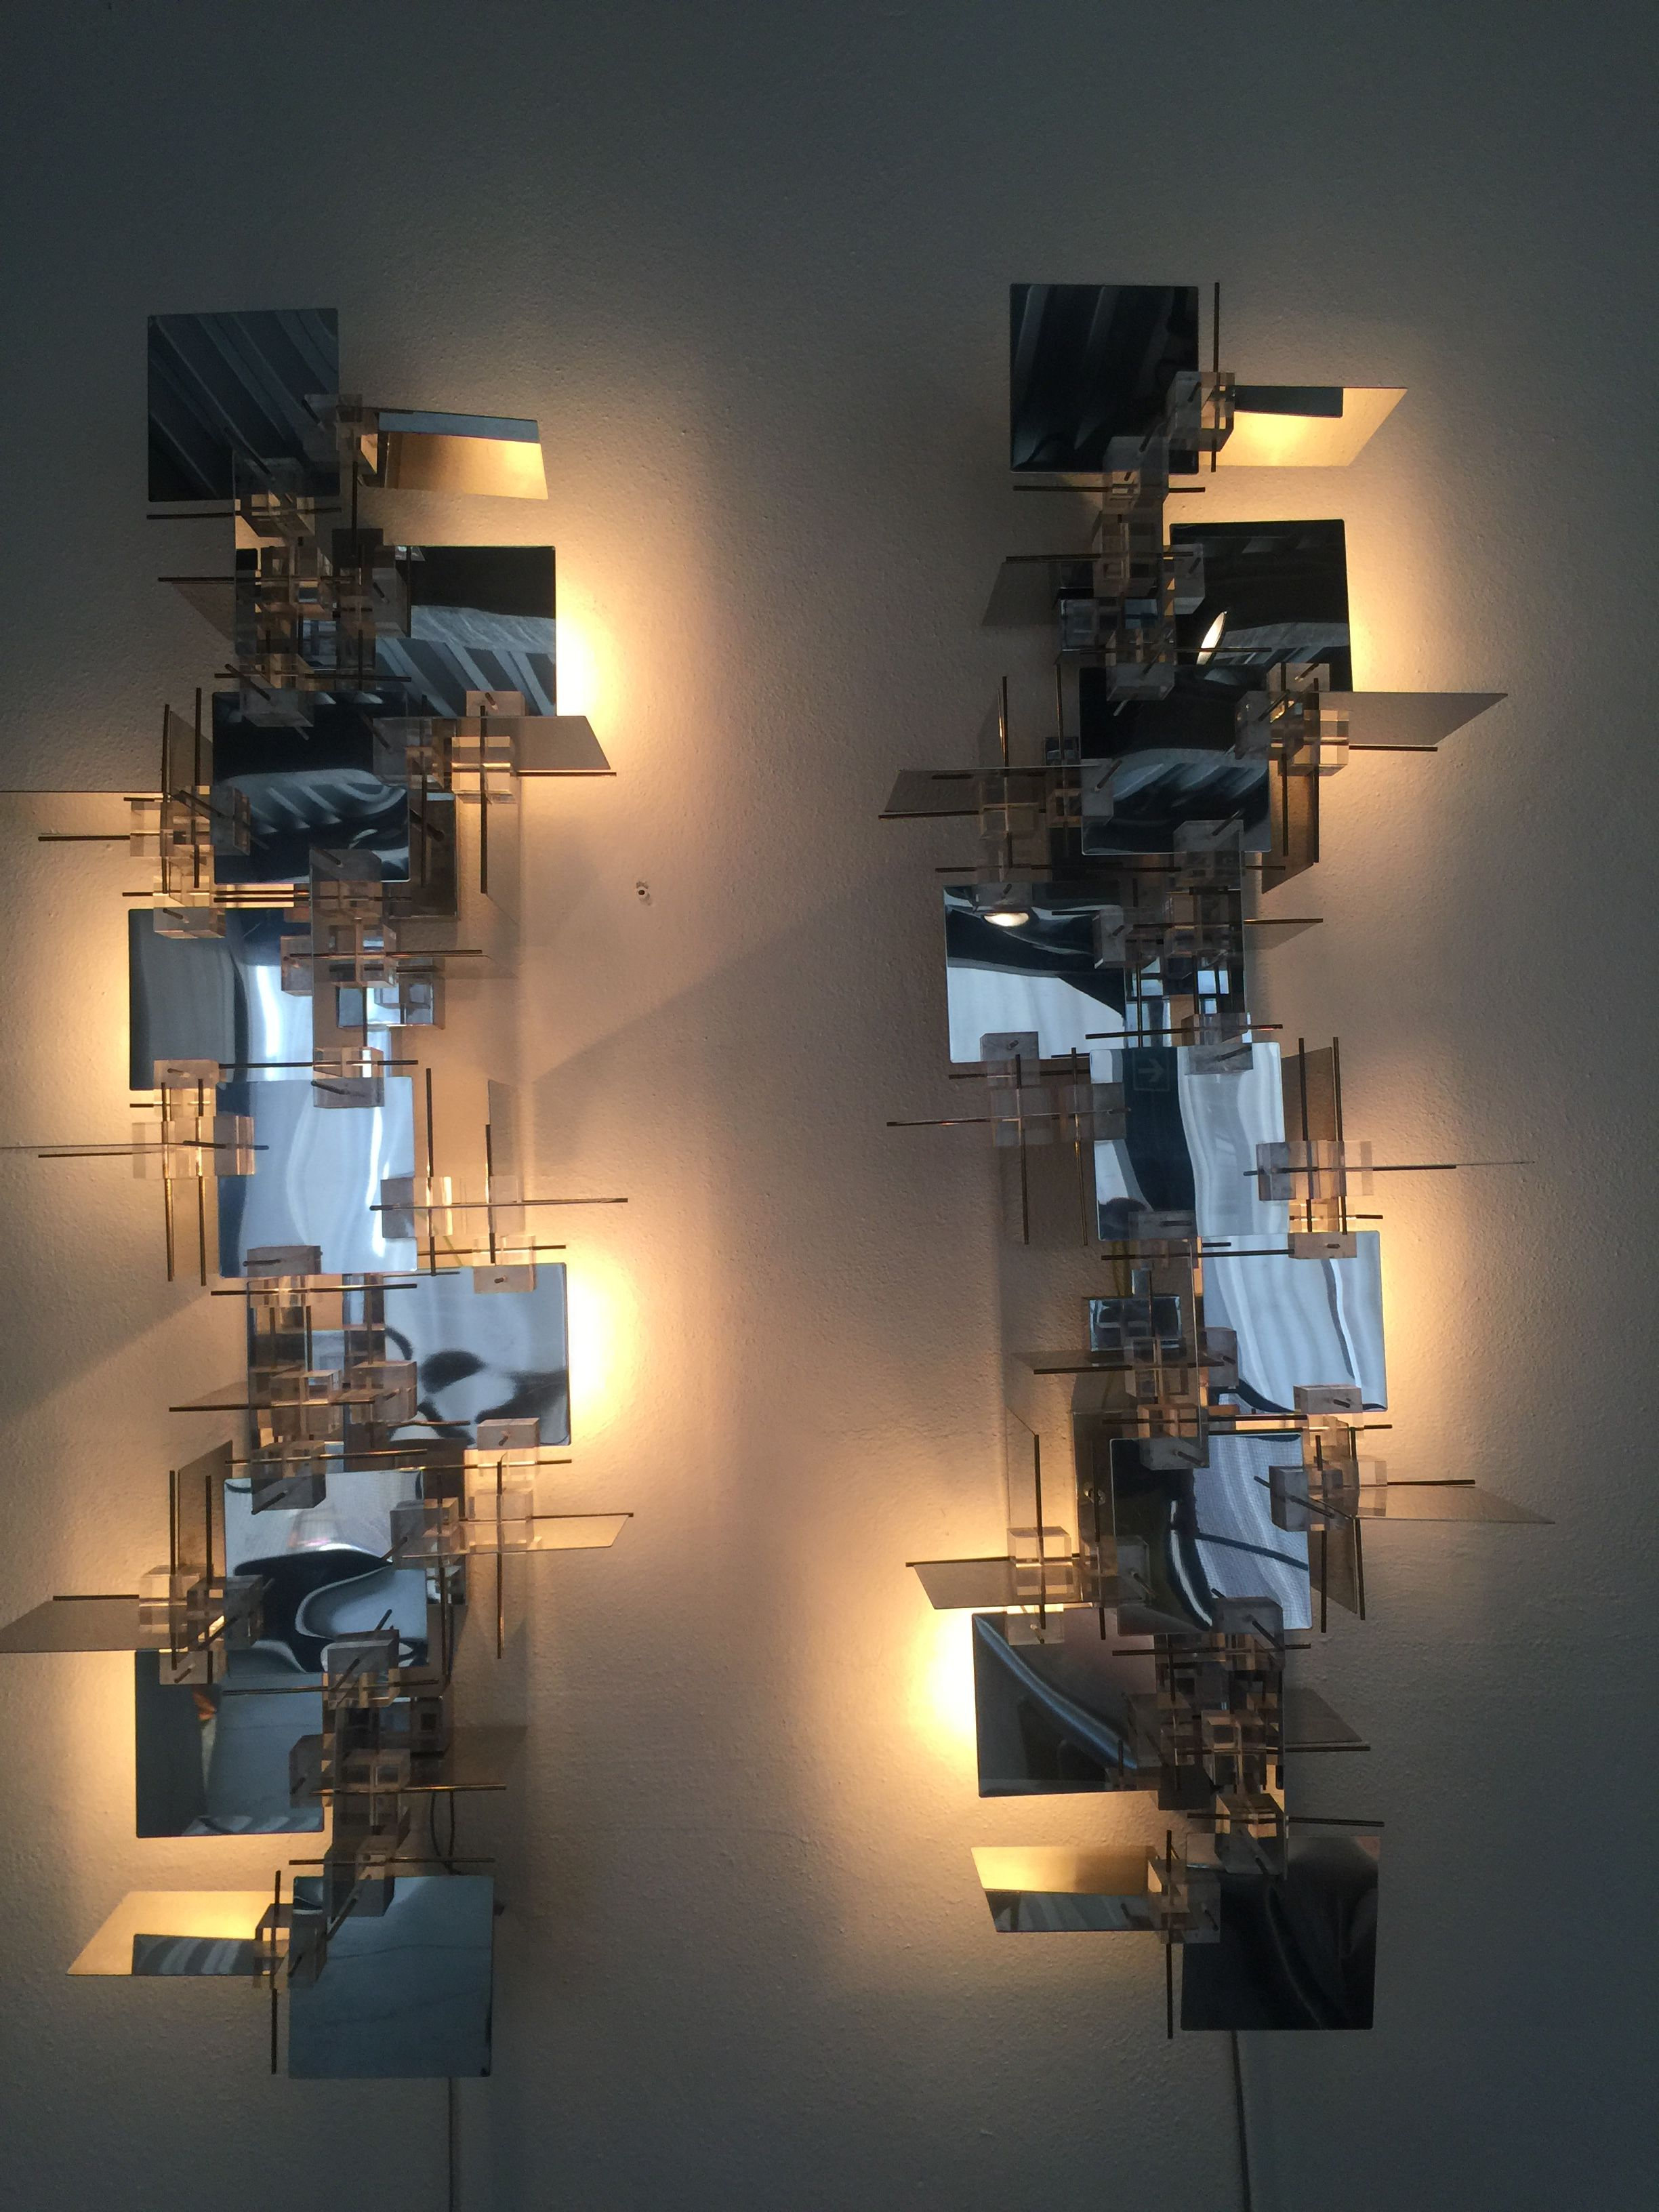 Pin di Roberta Roffi su Diy chandelier!